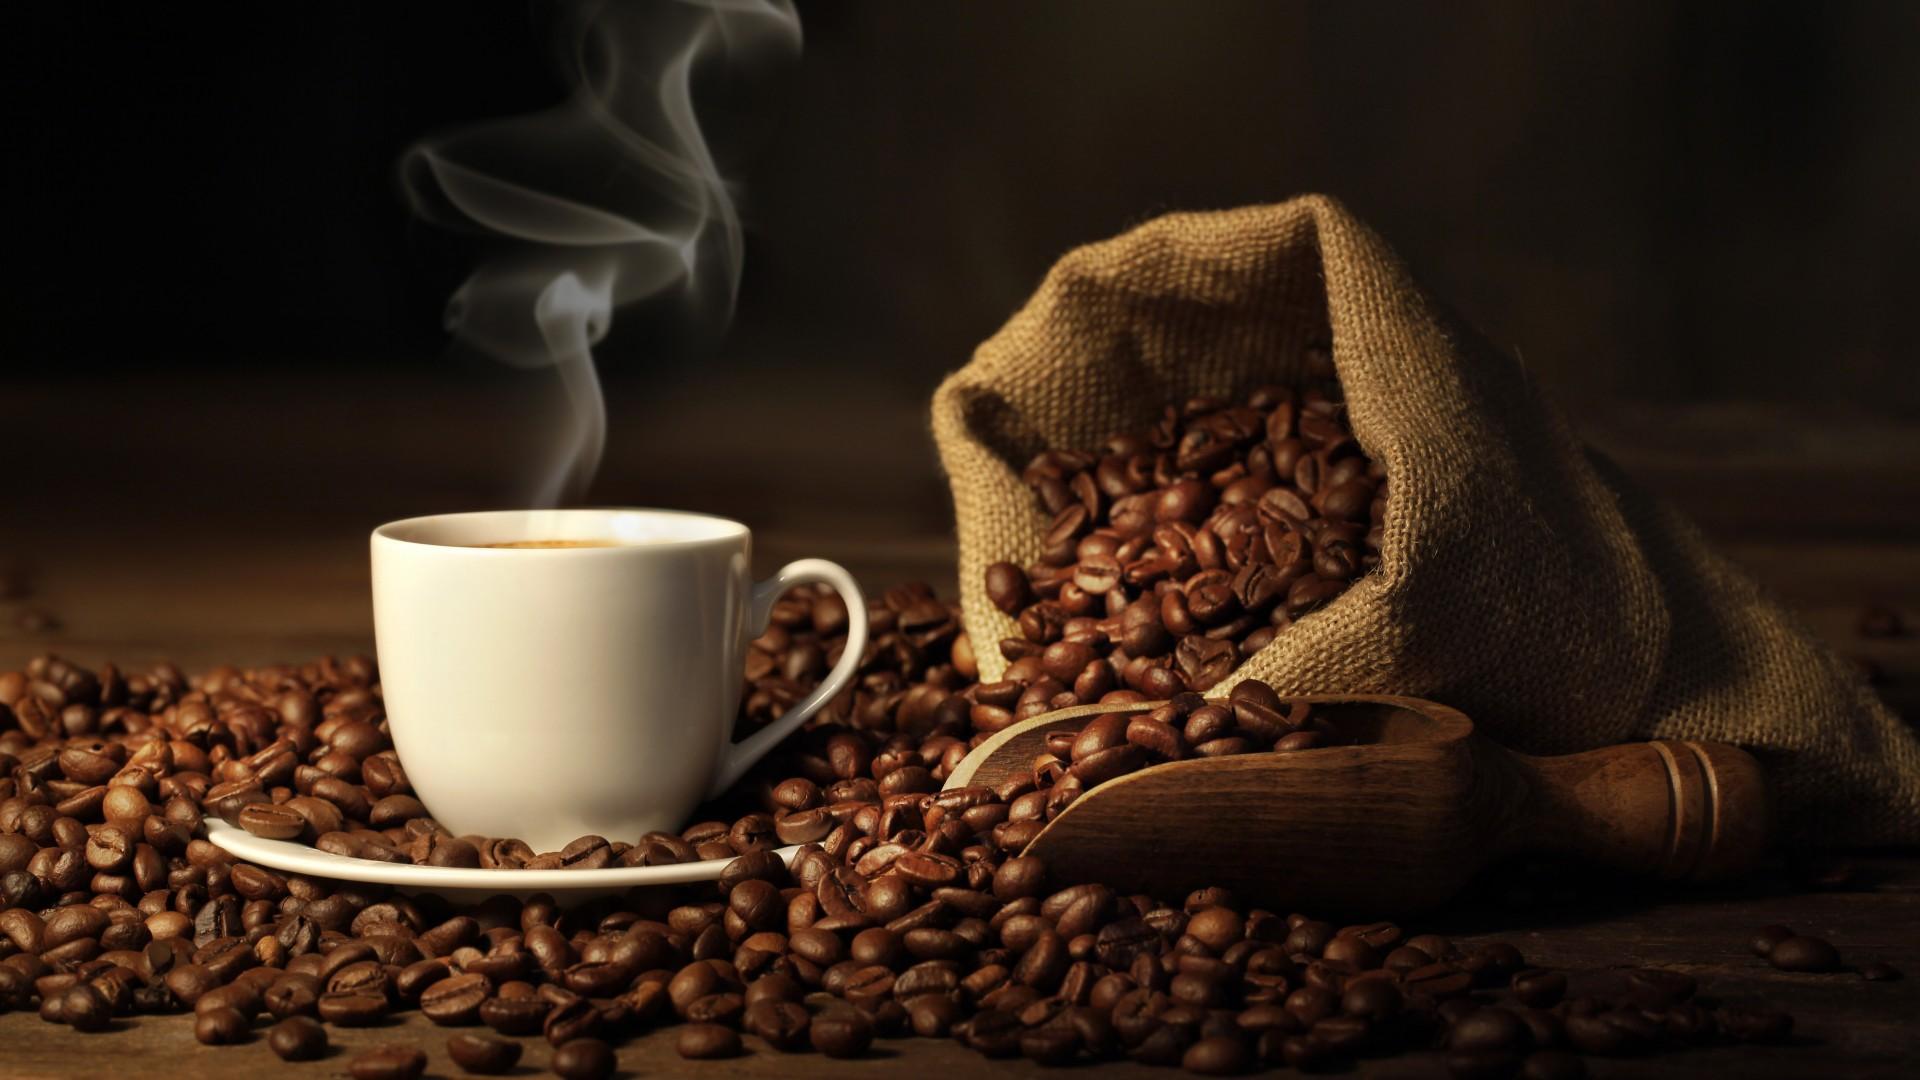 Coffee wallpaper | 1920x1080 | #41087